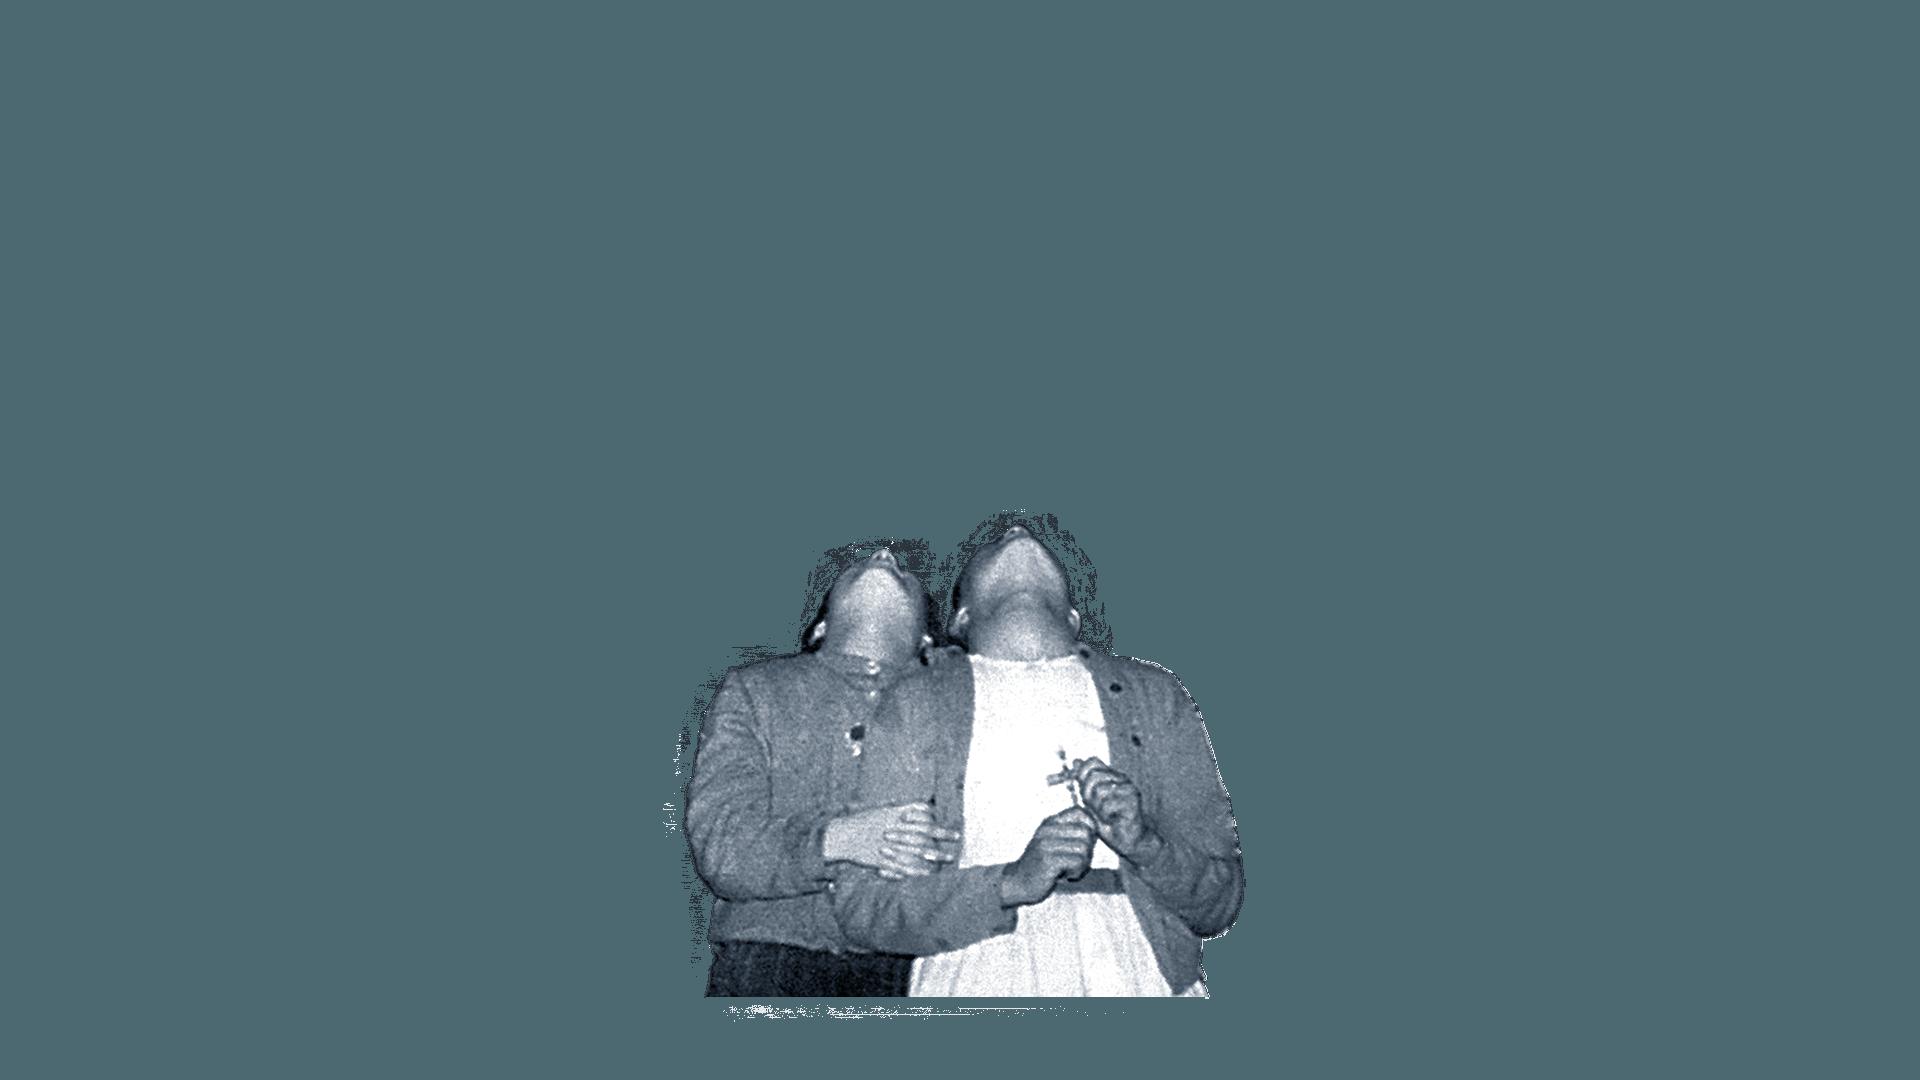 Capa de ilustración niñas